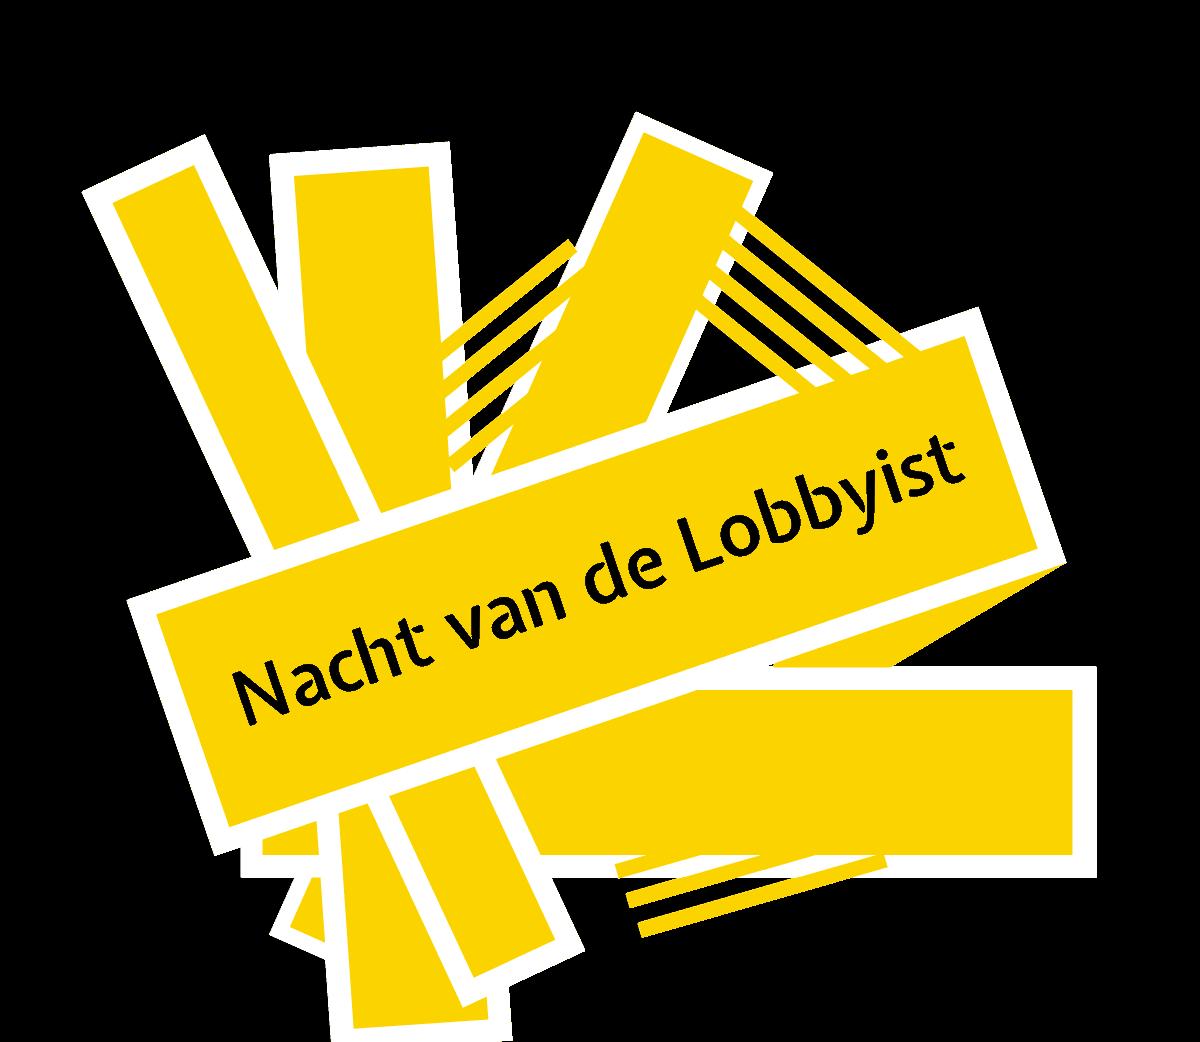 Nacht van de Lobbyist